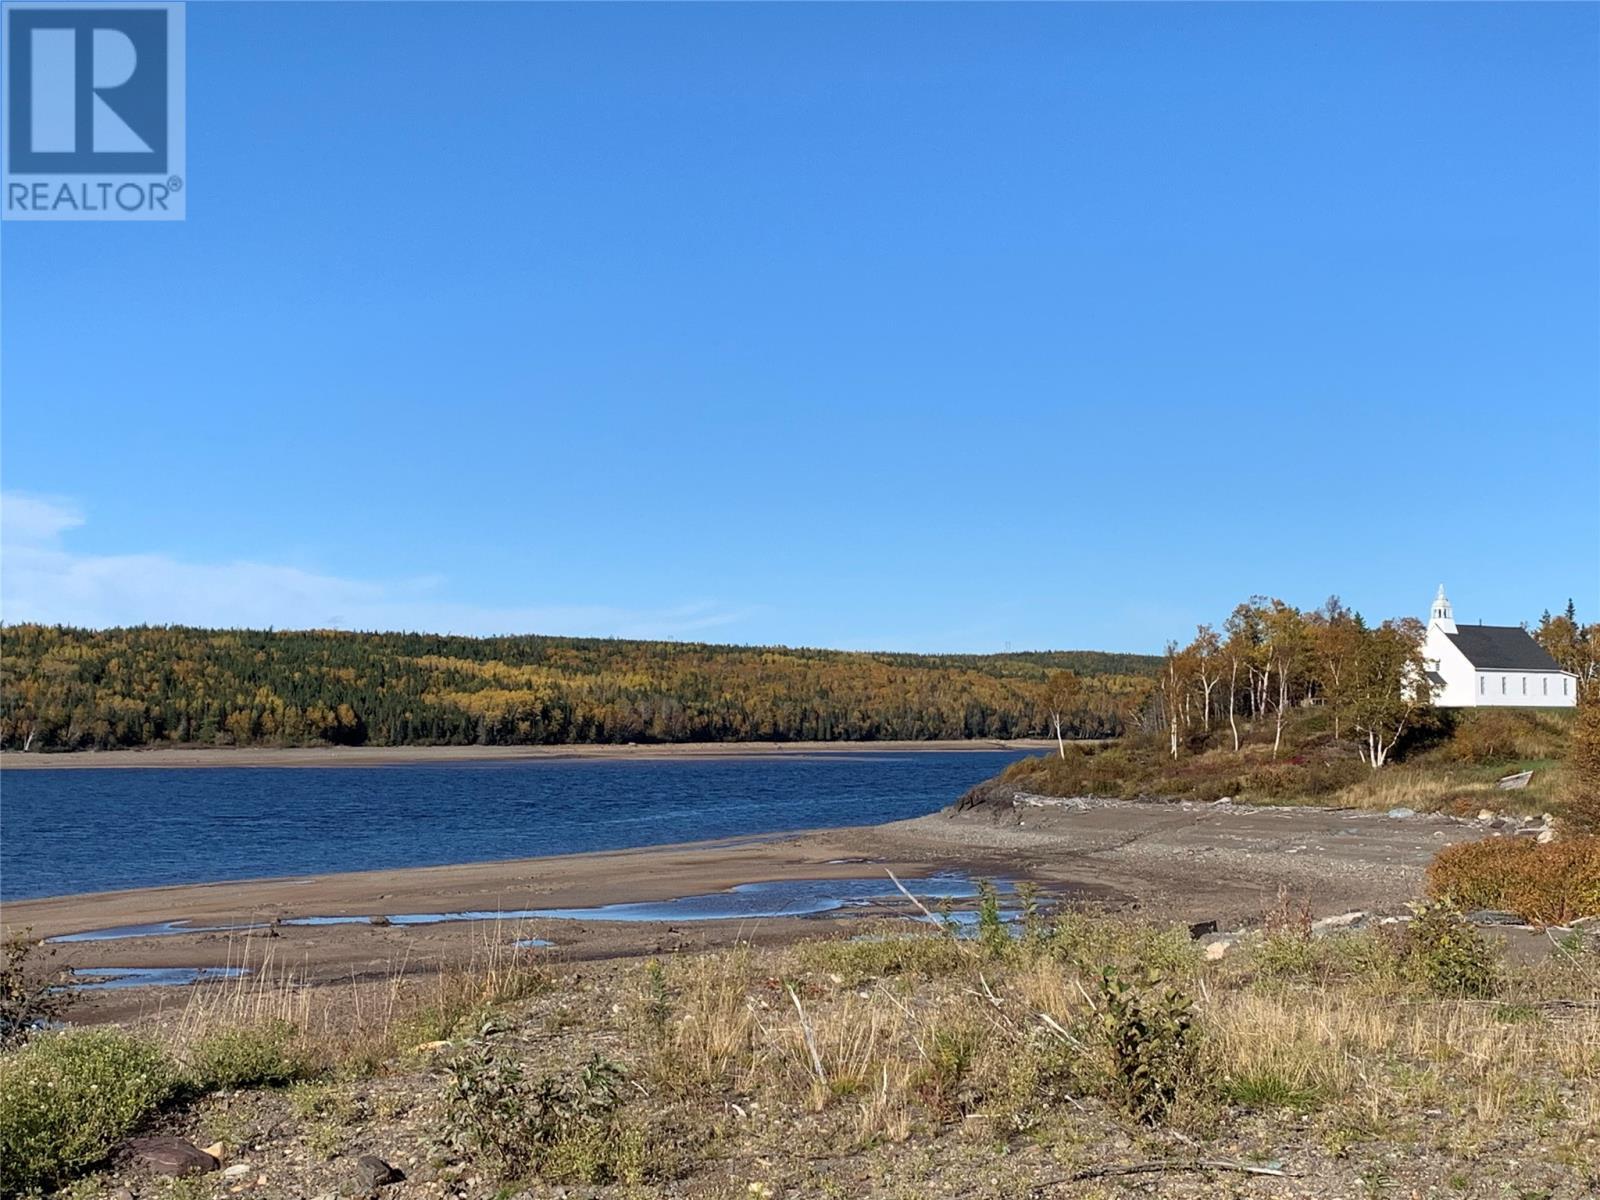 12 Lakeview Drive, Millertown, Newfoundland & Labrador  A0H 1V0 - Photo 4 - 1212369